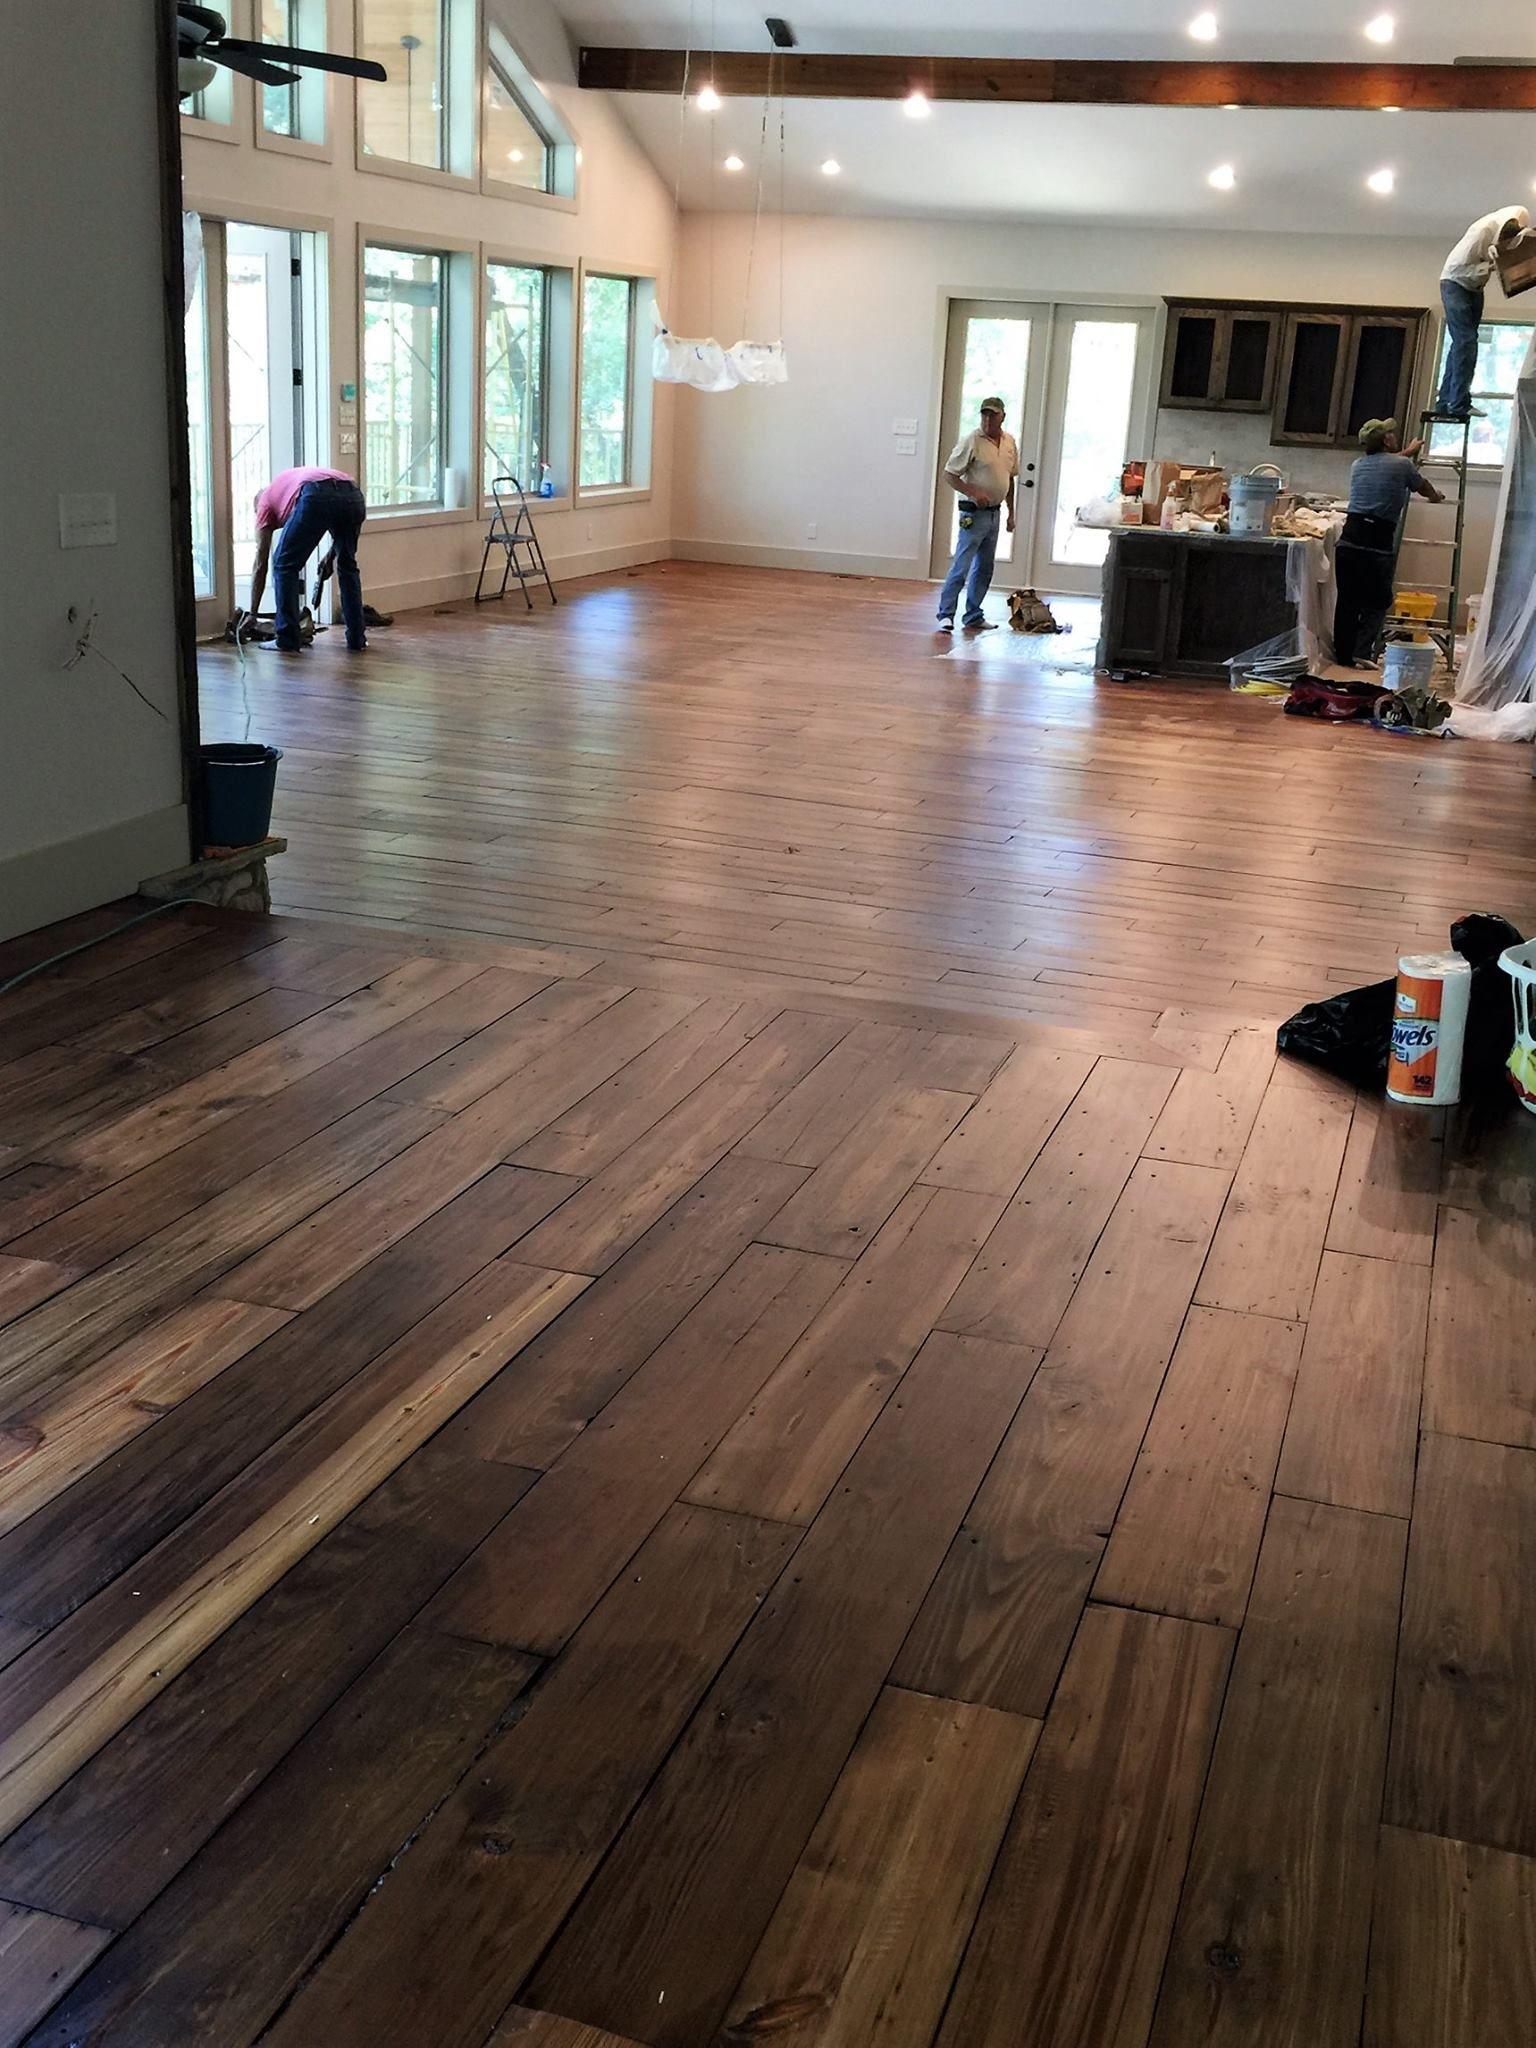 Reclaimed Wood Flooring Using Our Antique Lumber Antique Lumber Company Reclaimed Wood Barn Wood Wood Floors